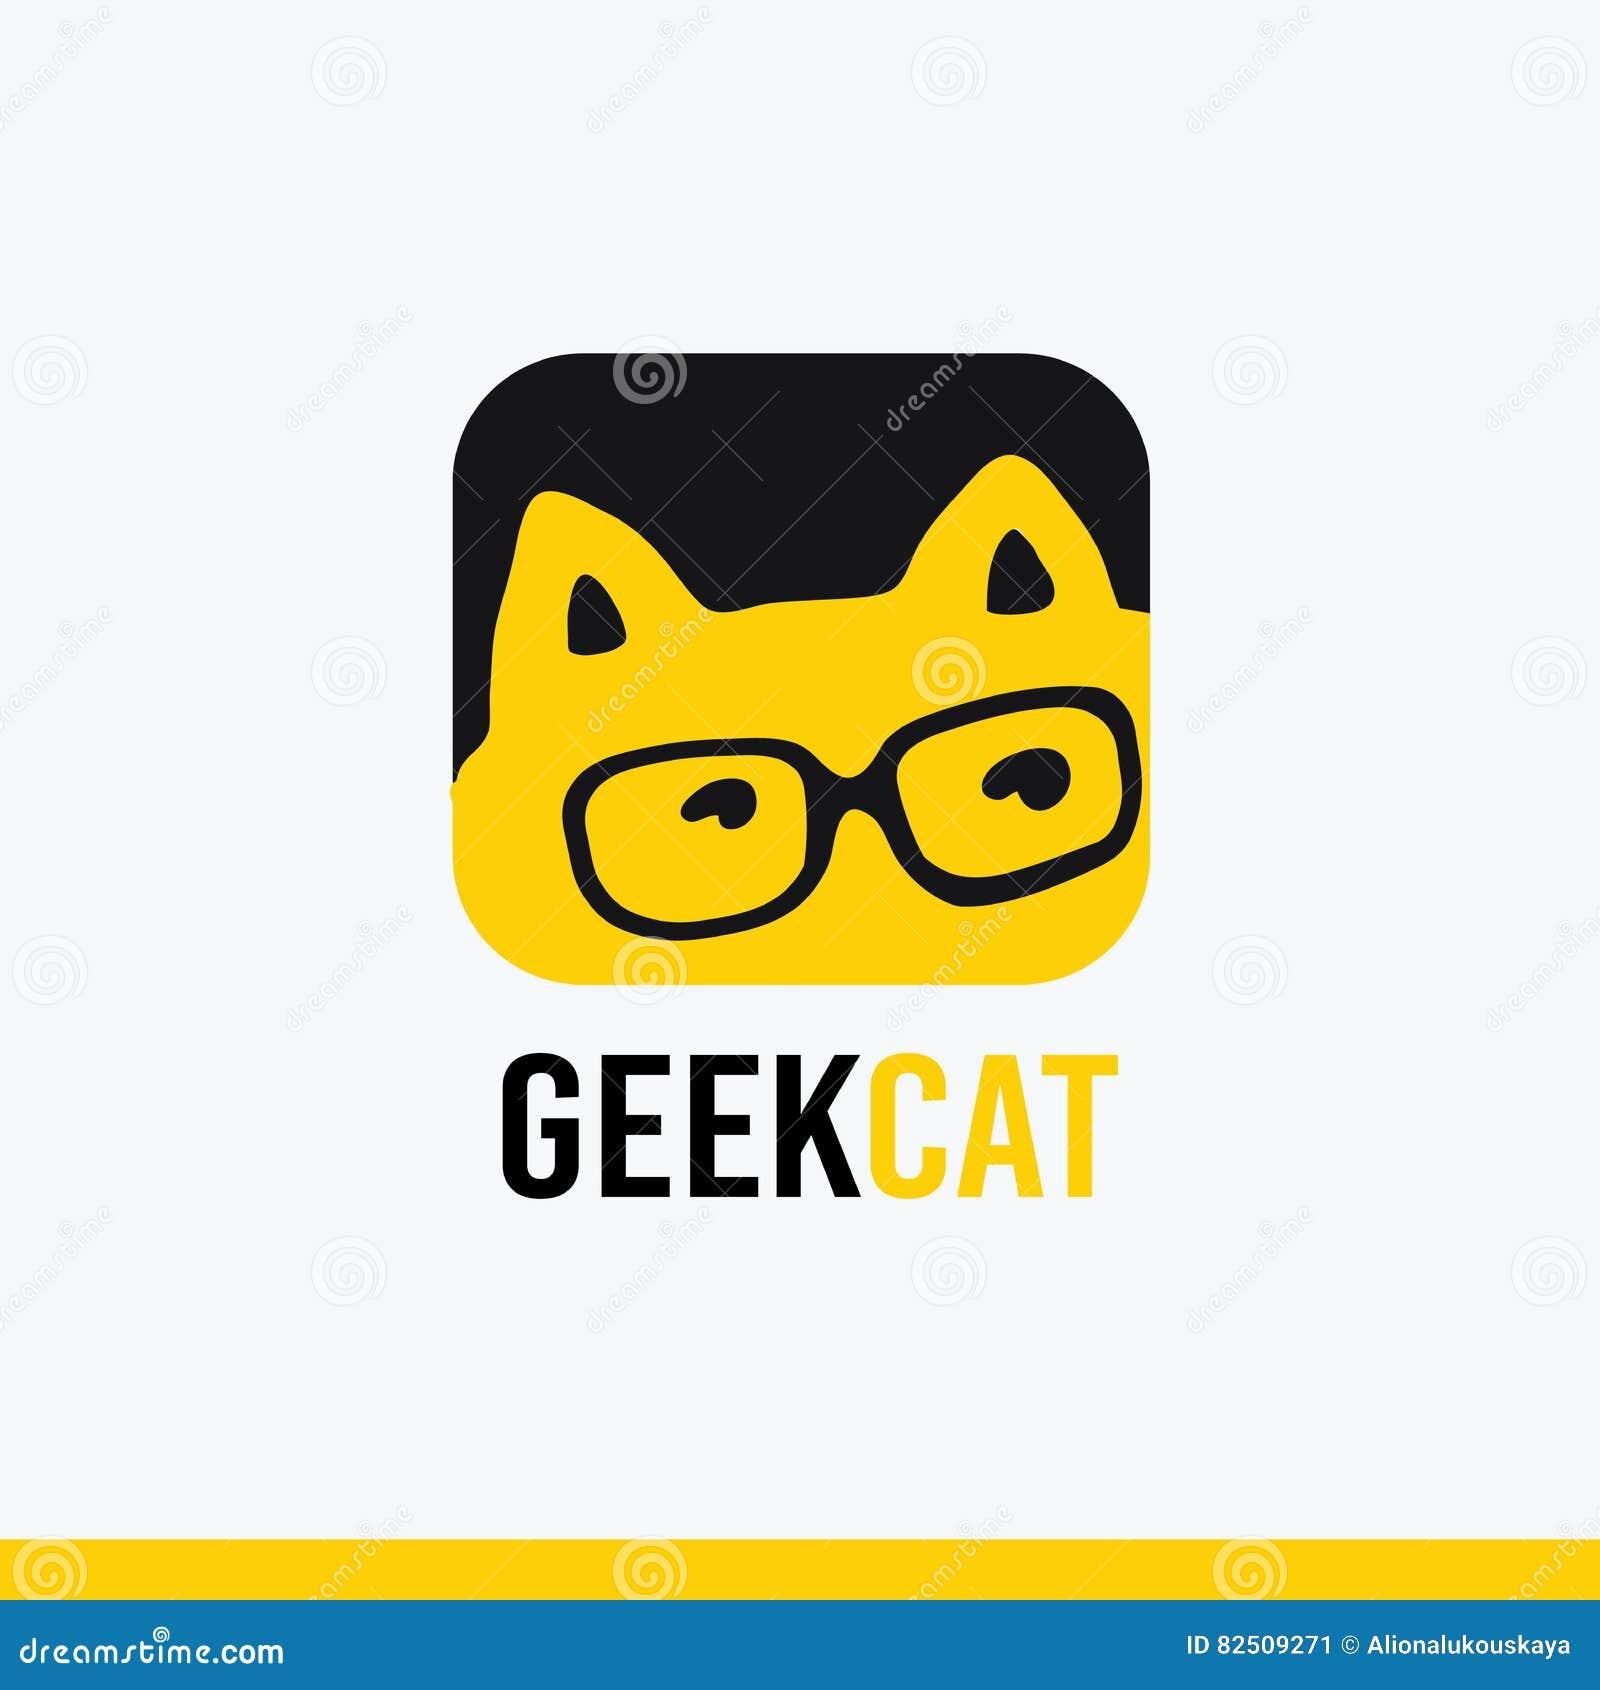 Logo, icon vector Geek cat logo templates, stylized cartoon cat